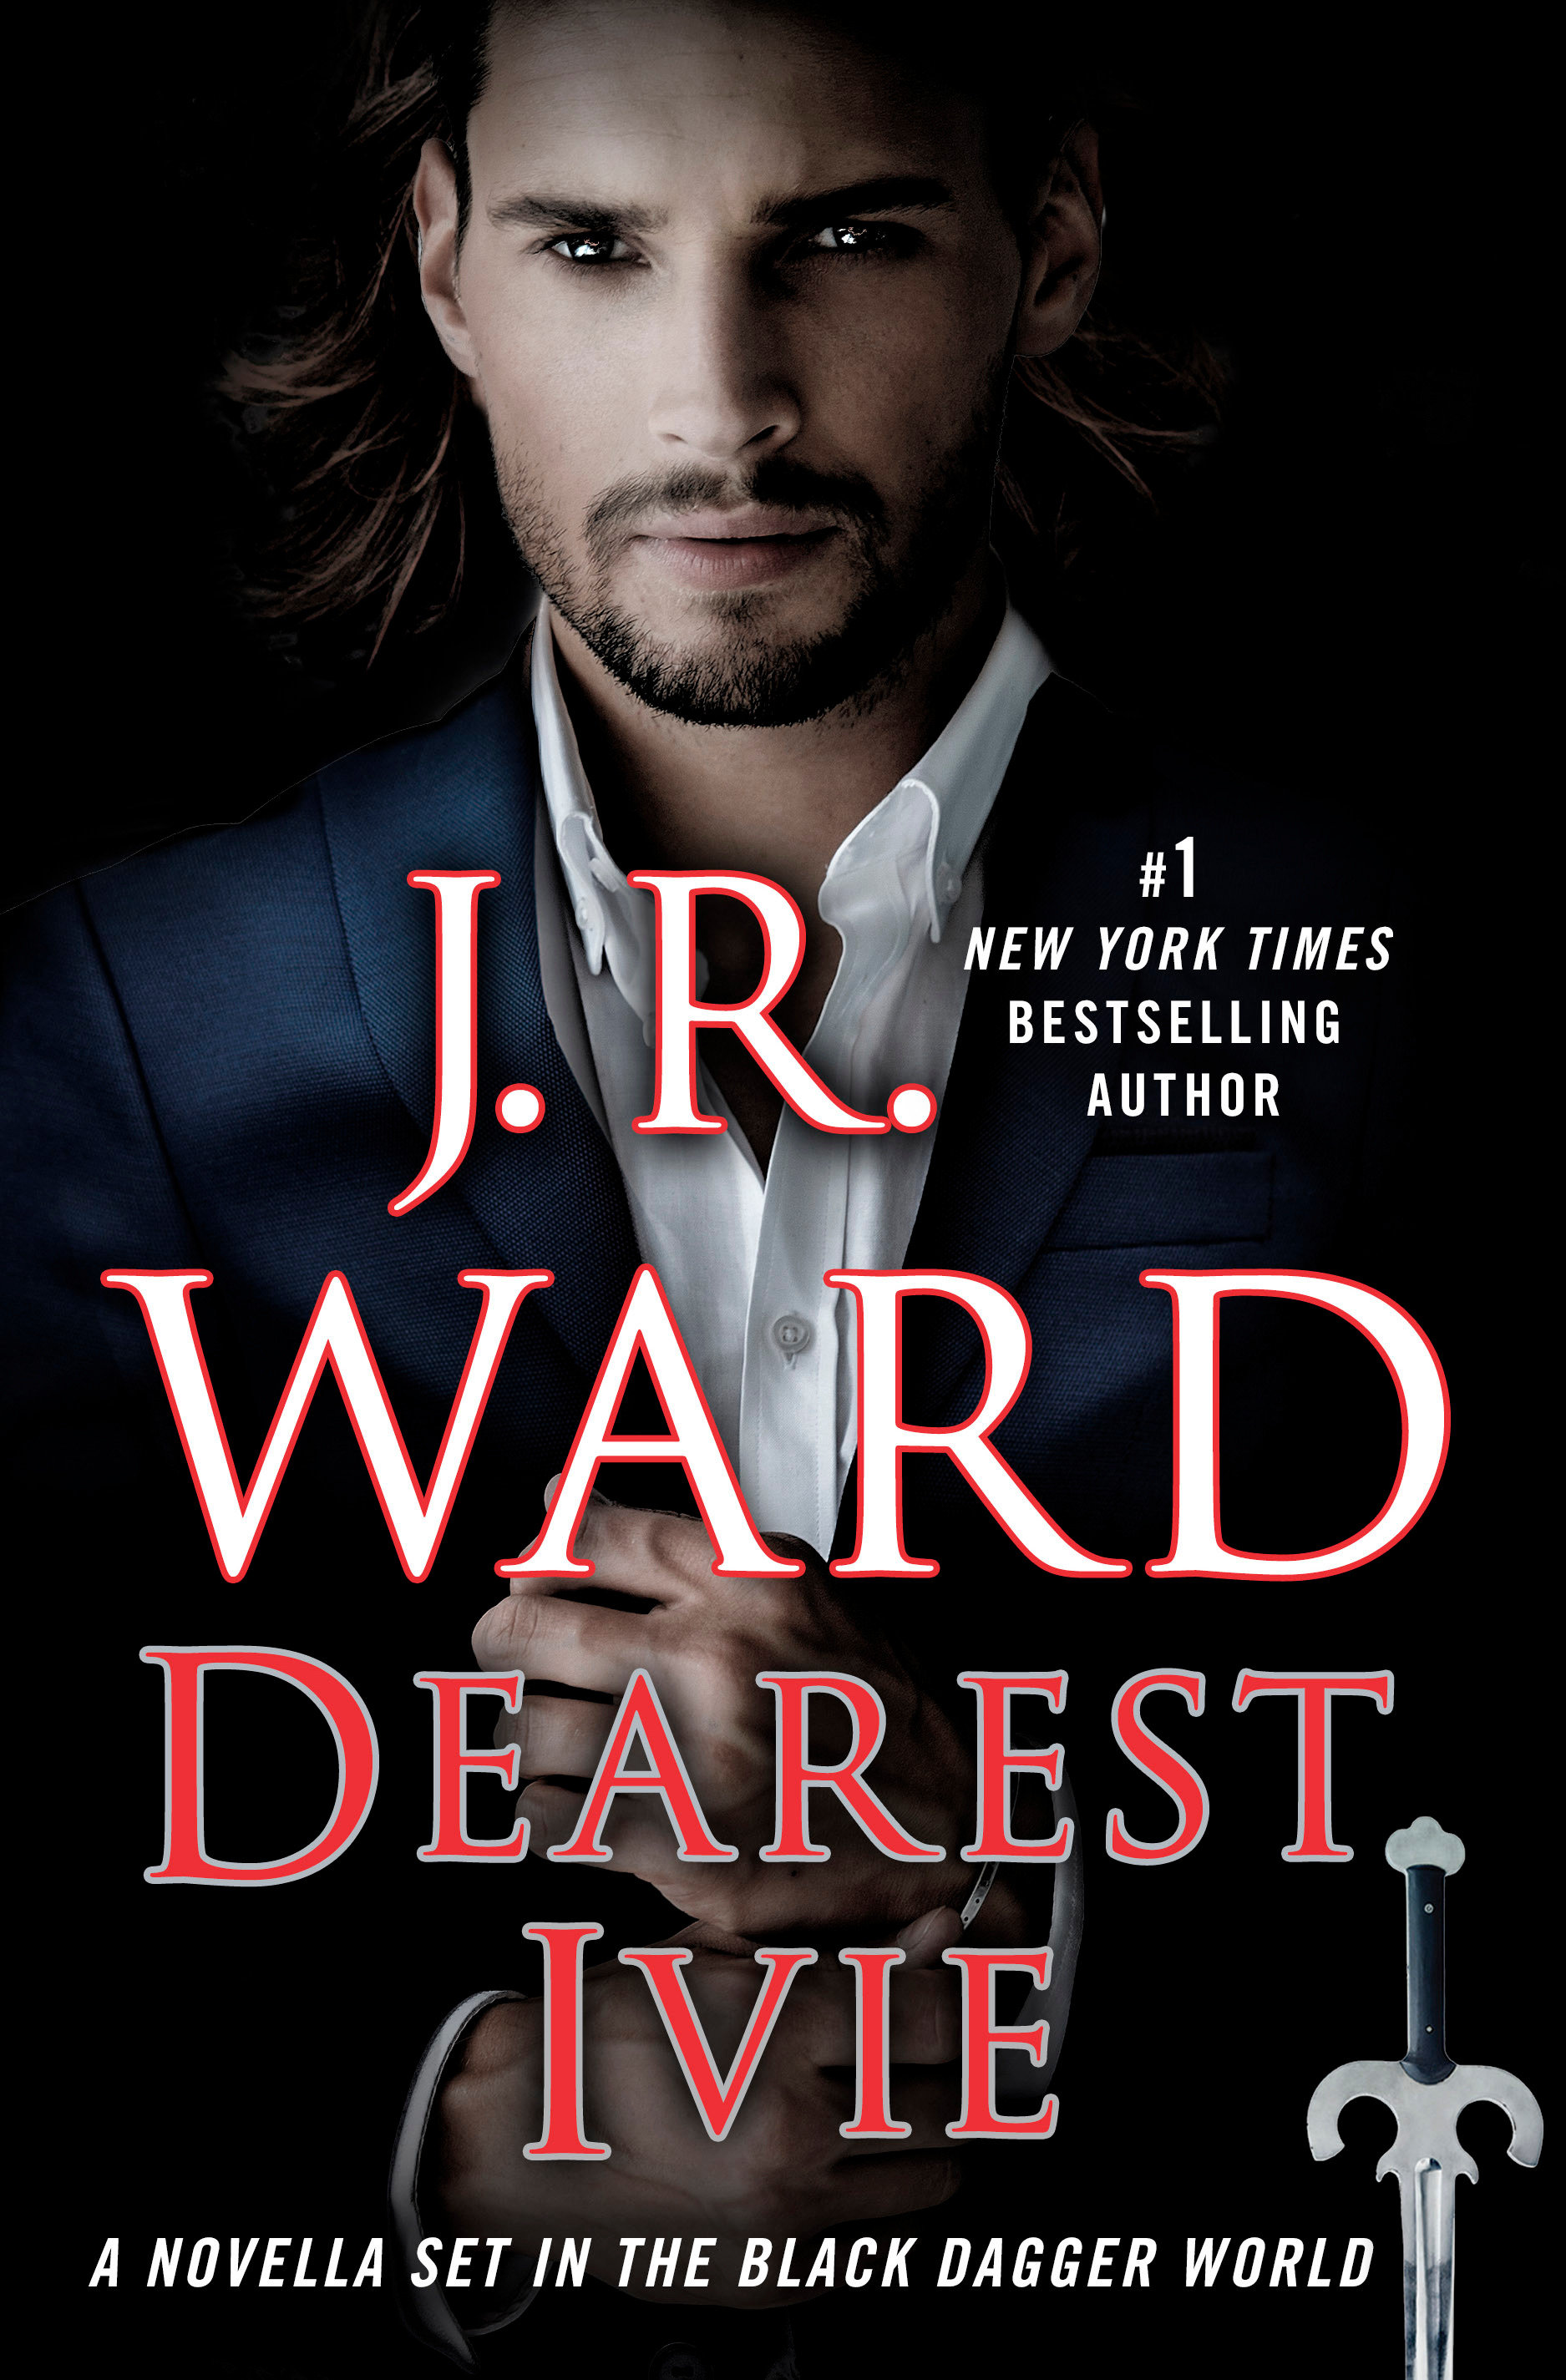 Cover Image of Dearest Ivie: A Novella Set in the Black Dagger World